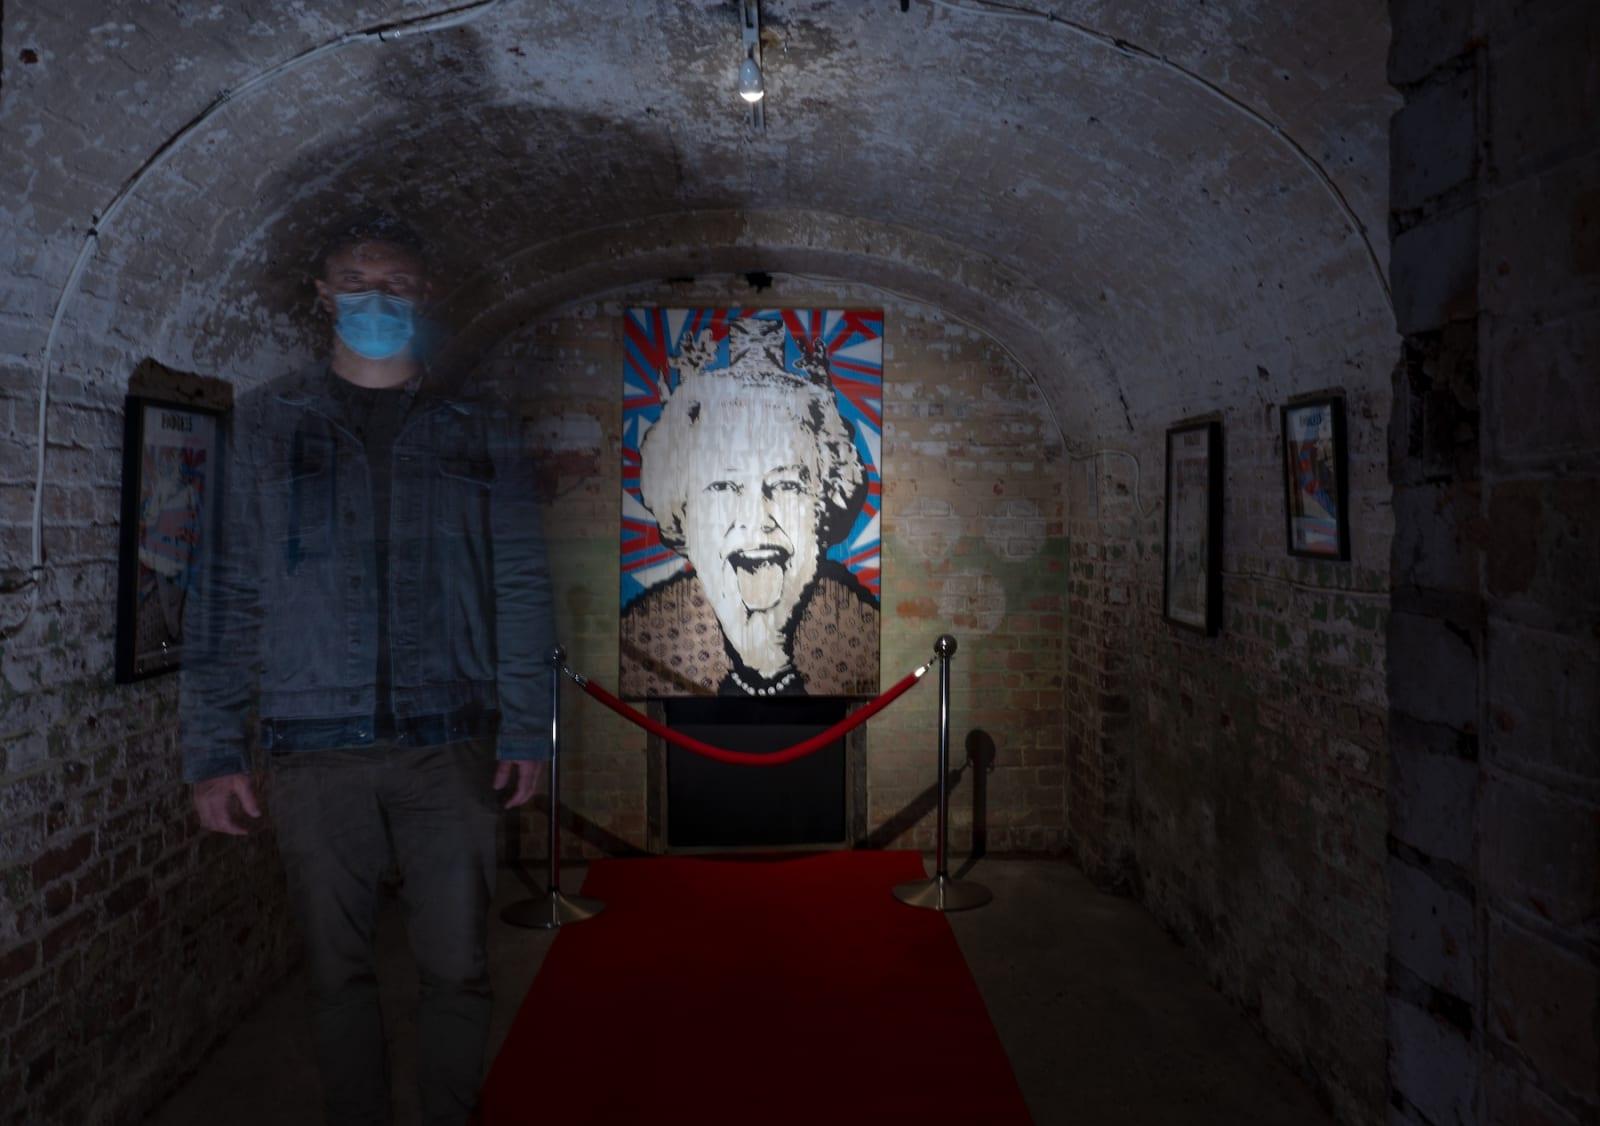 The Queen & Culture Exhibition